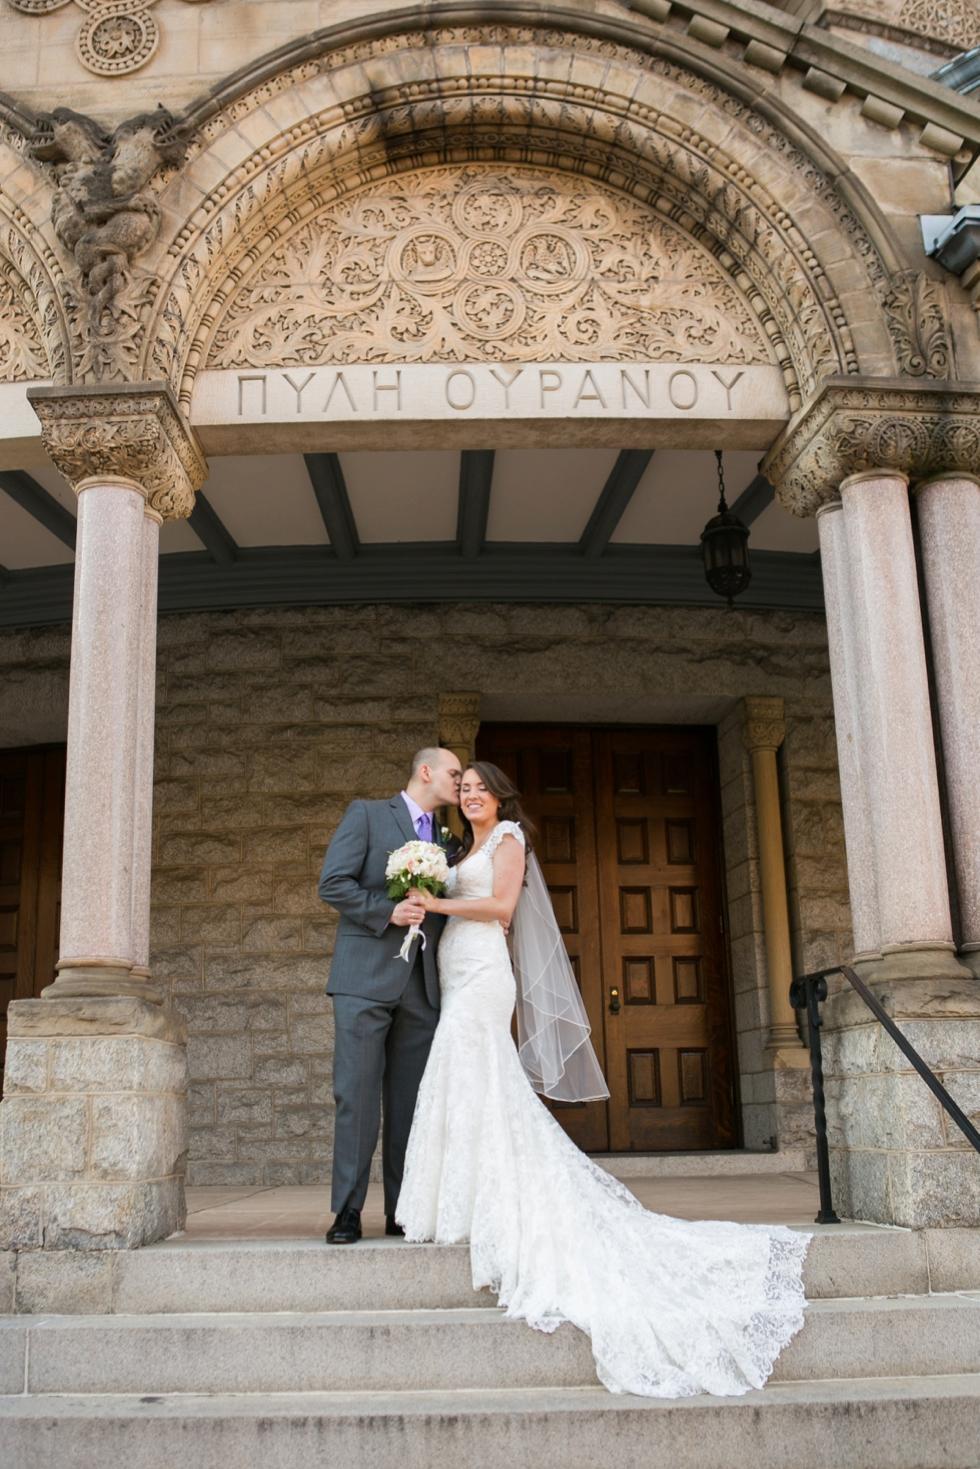 Best Philadelphia Wedding Photographer - 2016 Wedding Recap - Four Seasons Hotel